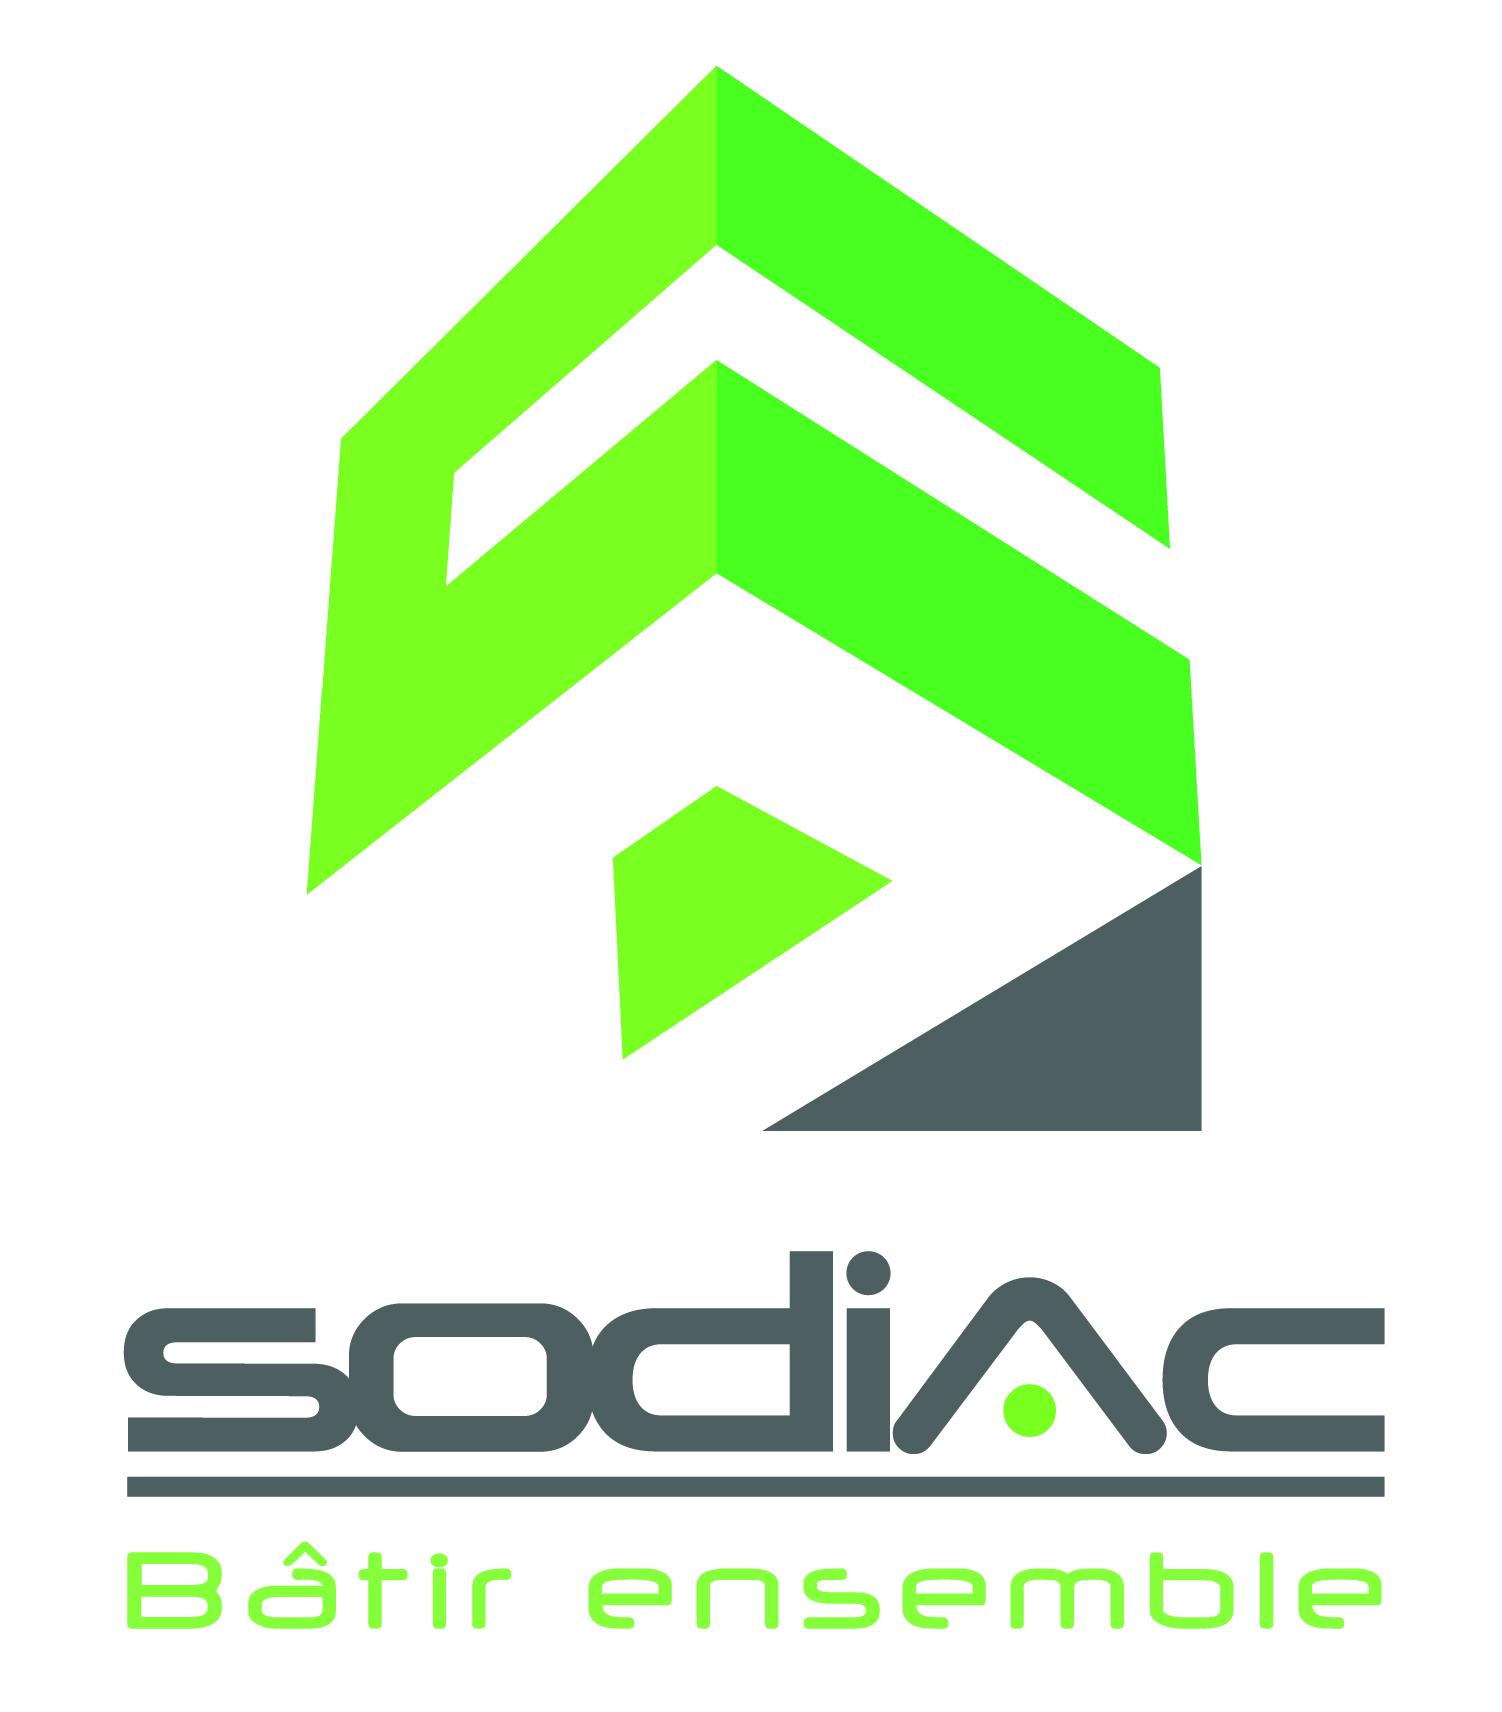 sodiac